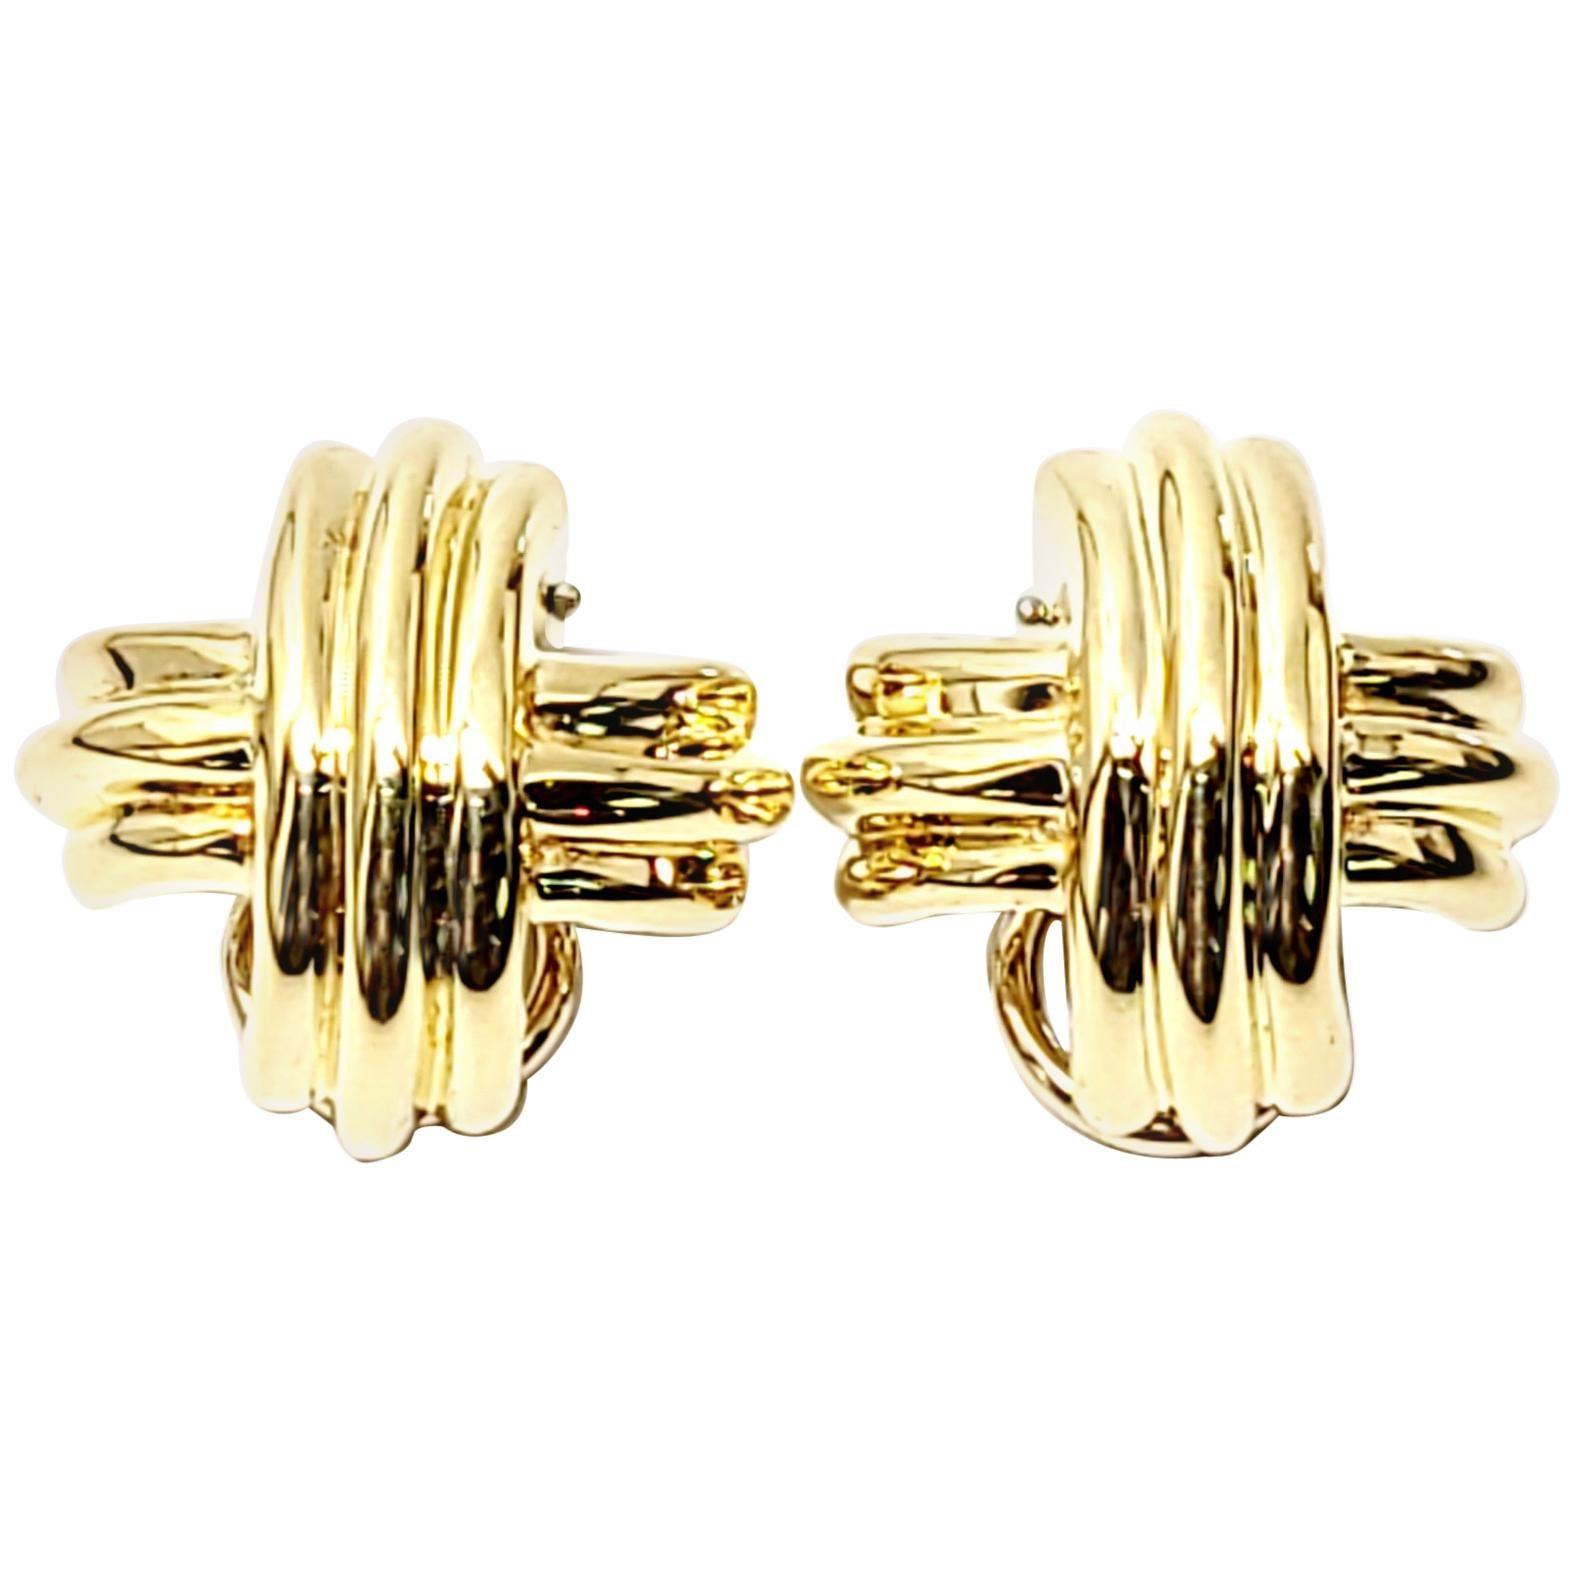 Tiffany & Co. 18 Karat Yellow Gold Signature X Clip-On Earrings